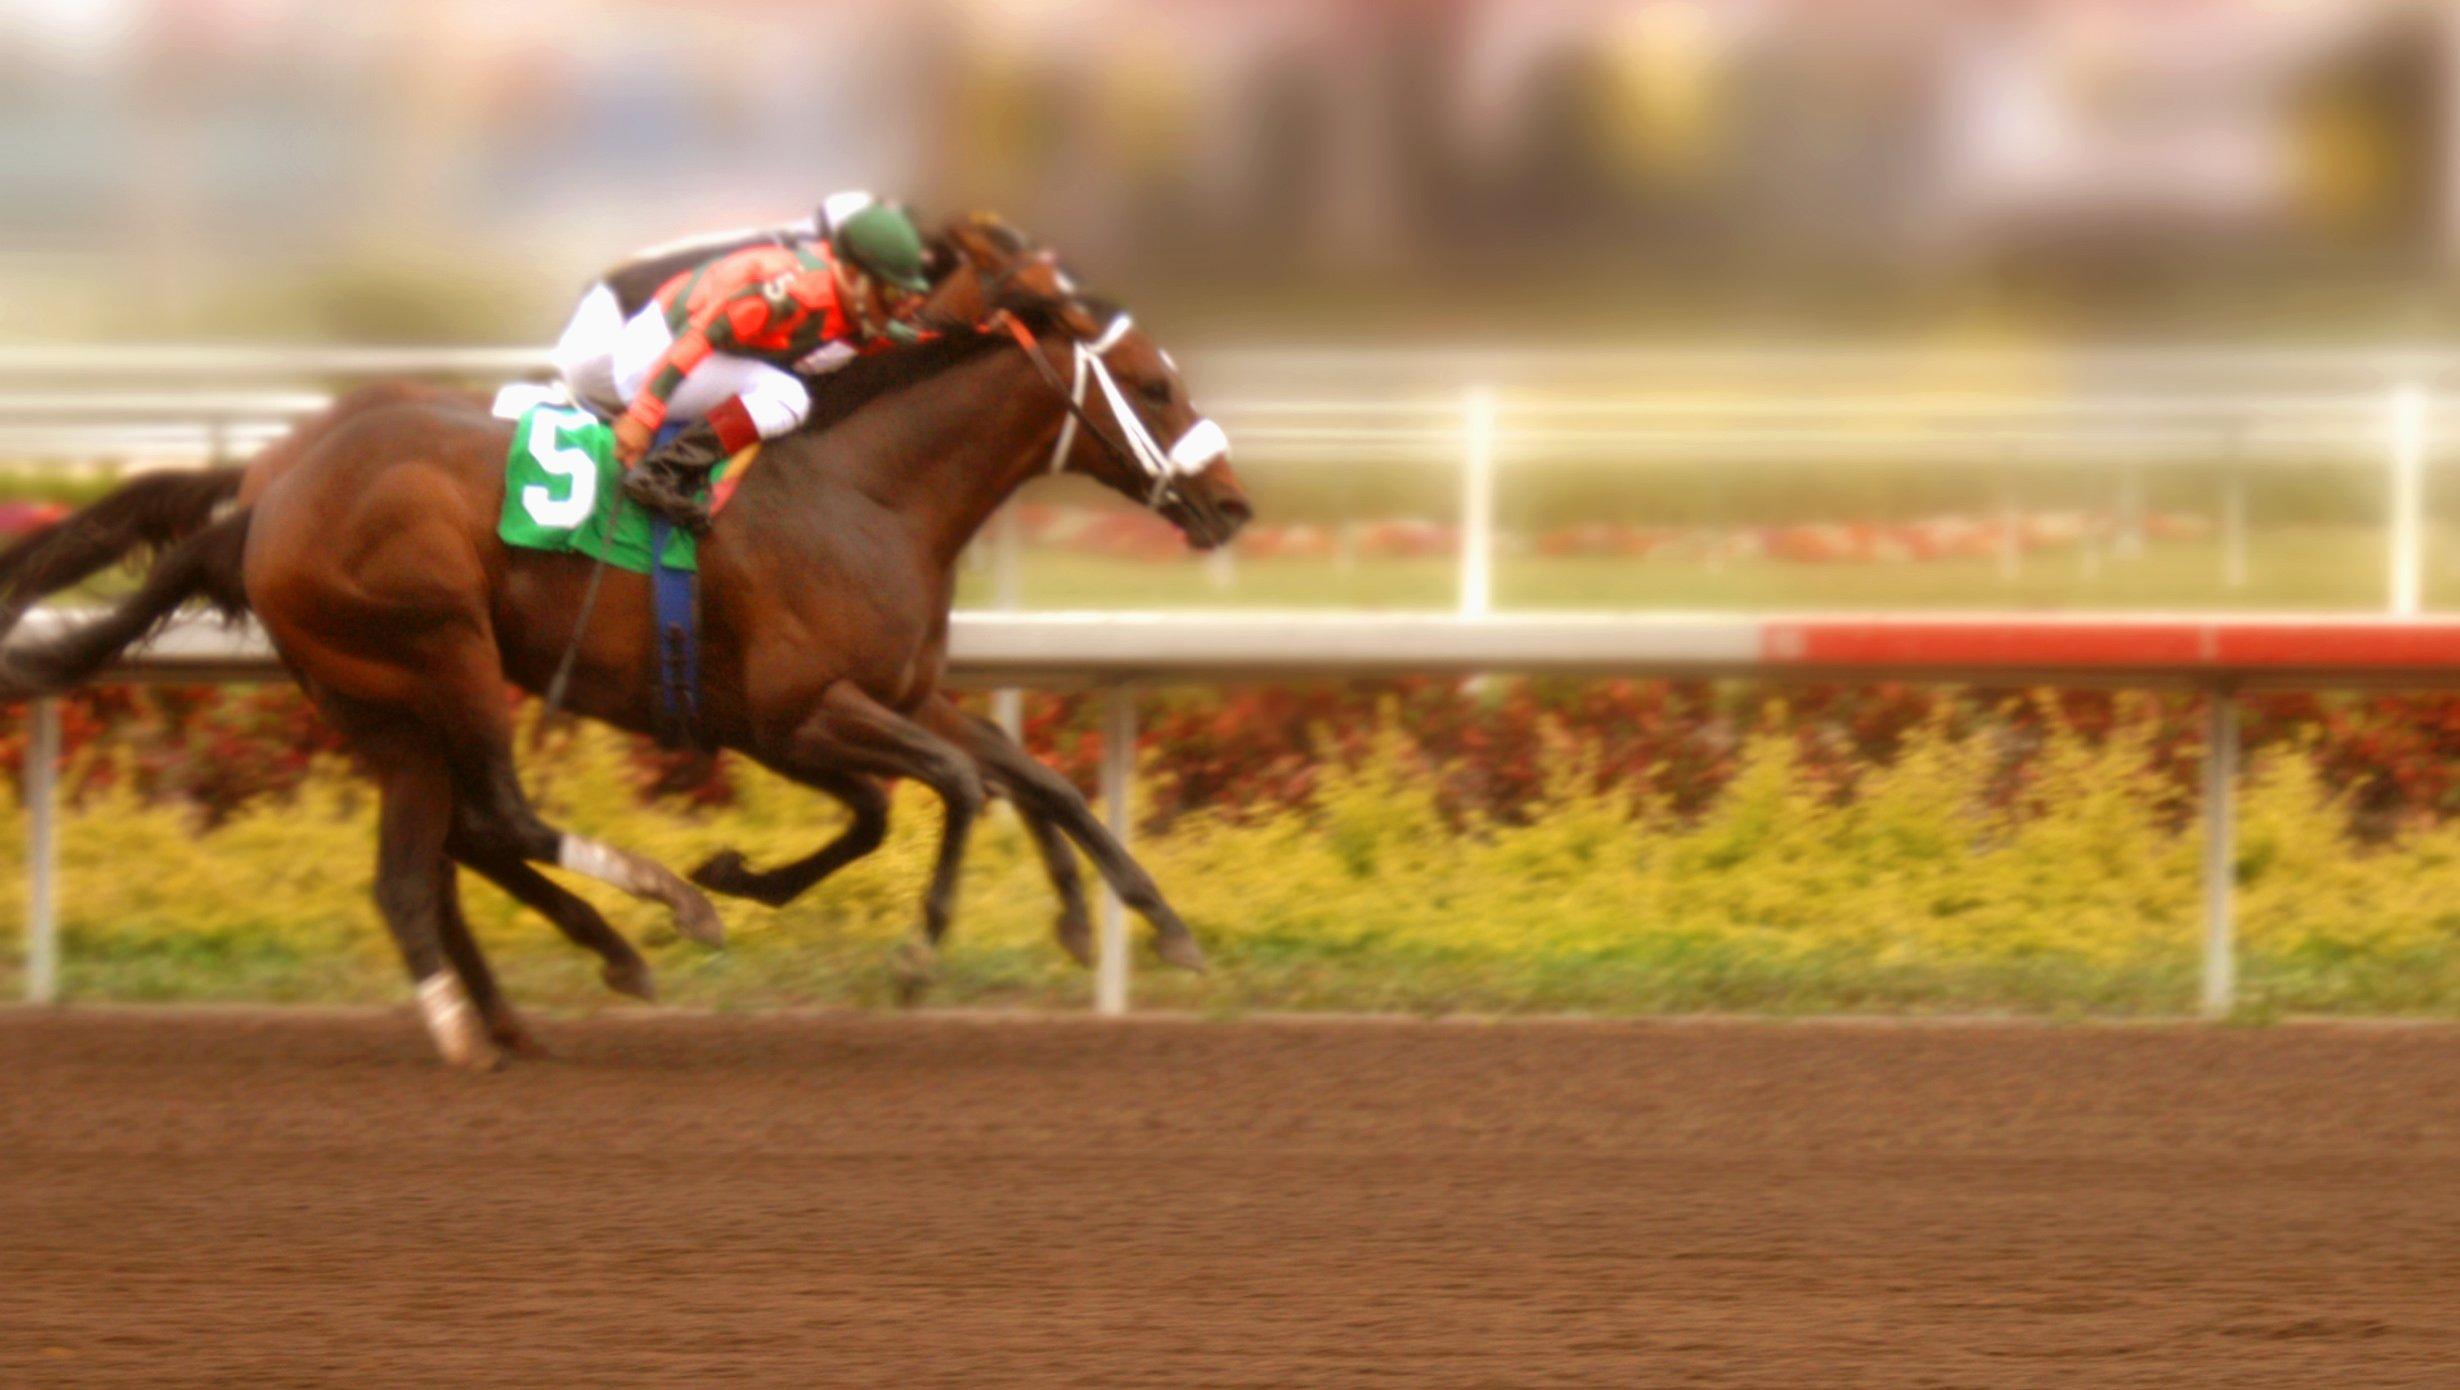 Horse Racing Calendar: Must See Events In 2020 Regarding Santa Anita Racetrack 2020 Calendar